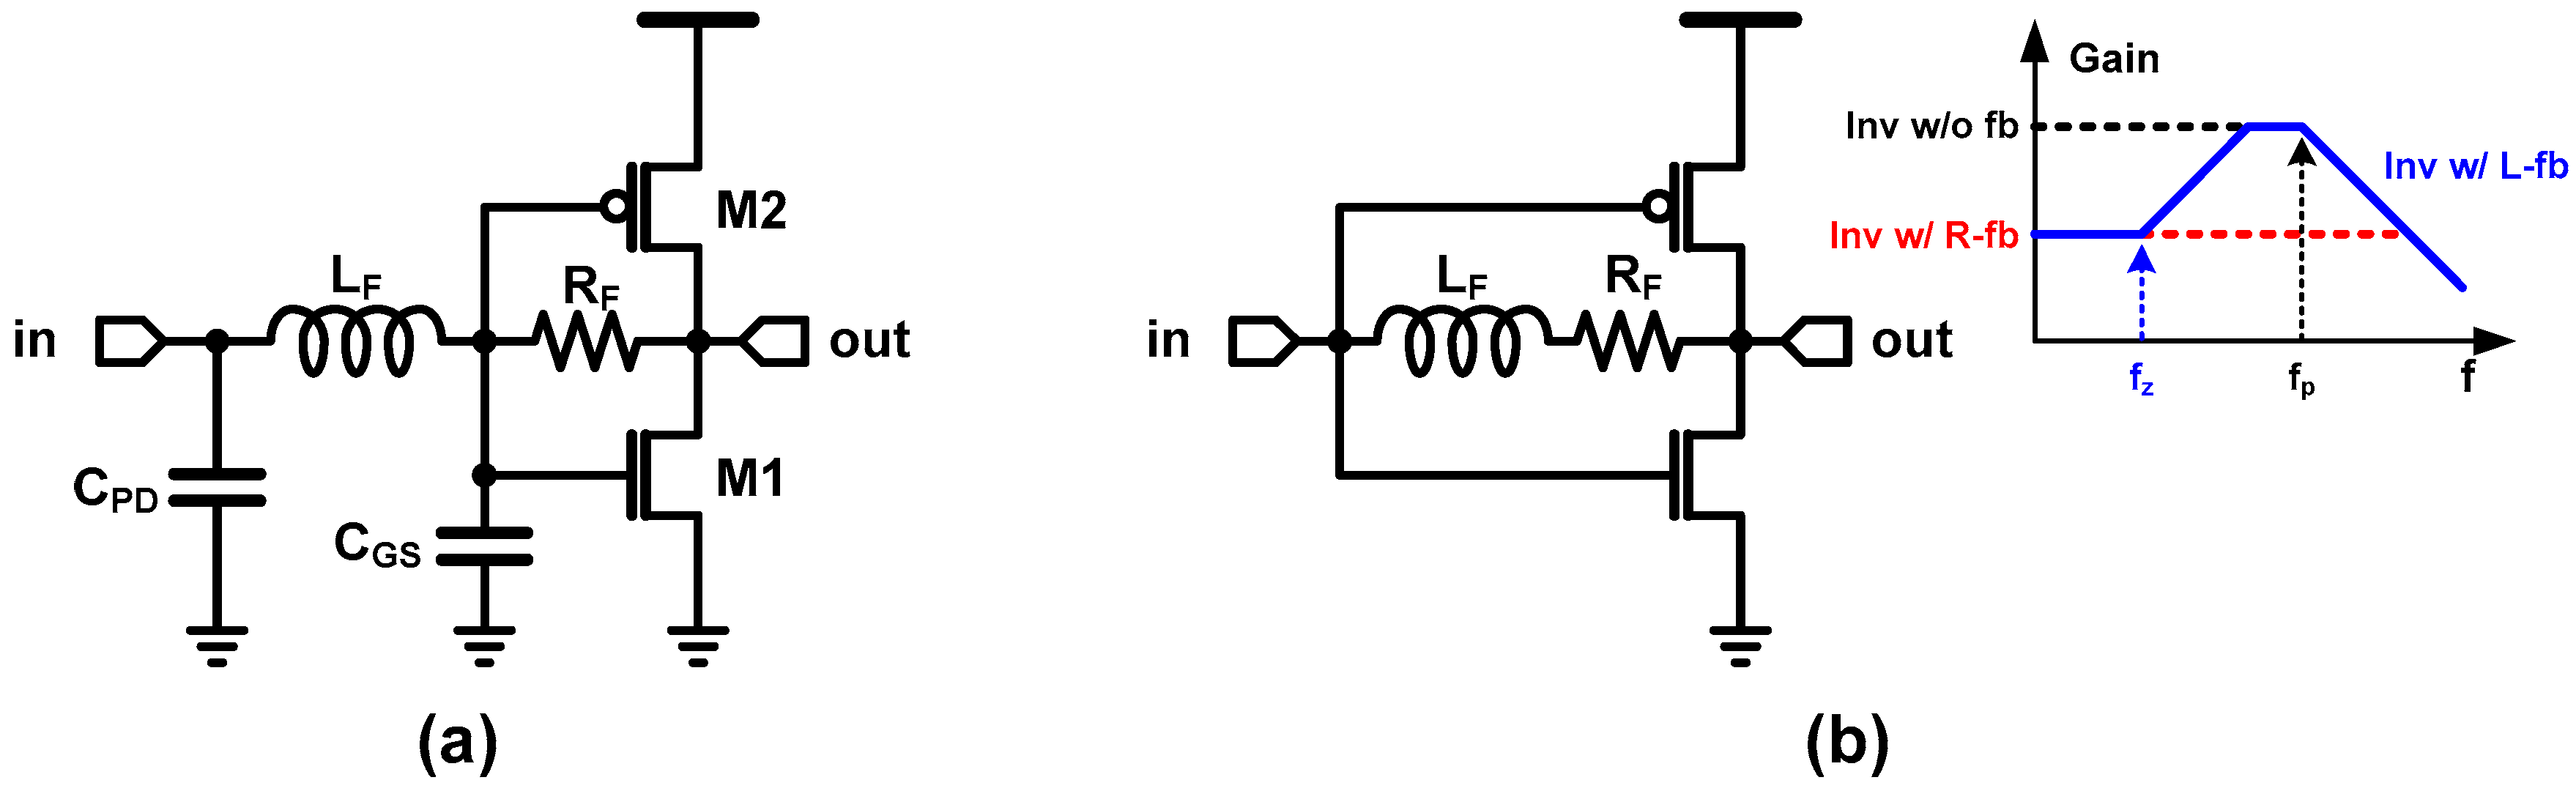 JLPEA | Free Full-Text | CMOS Inverter as Analog Circuit: An